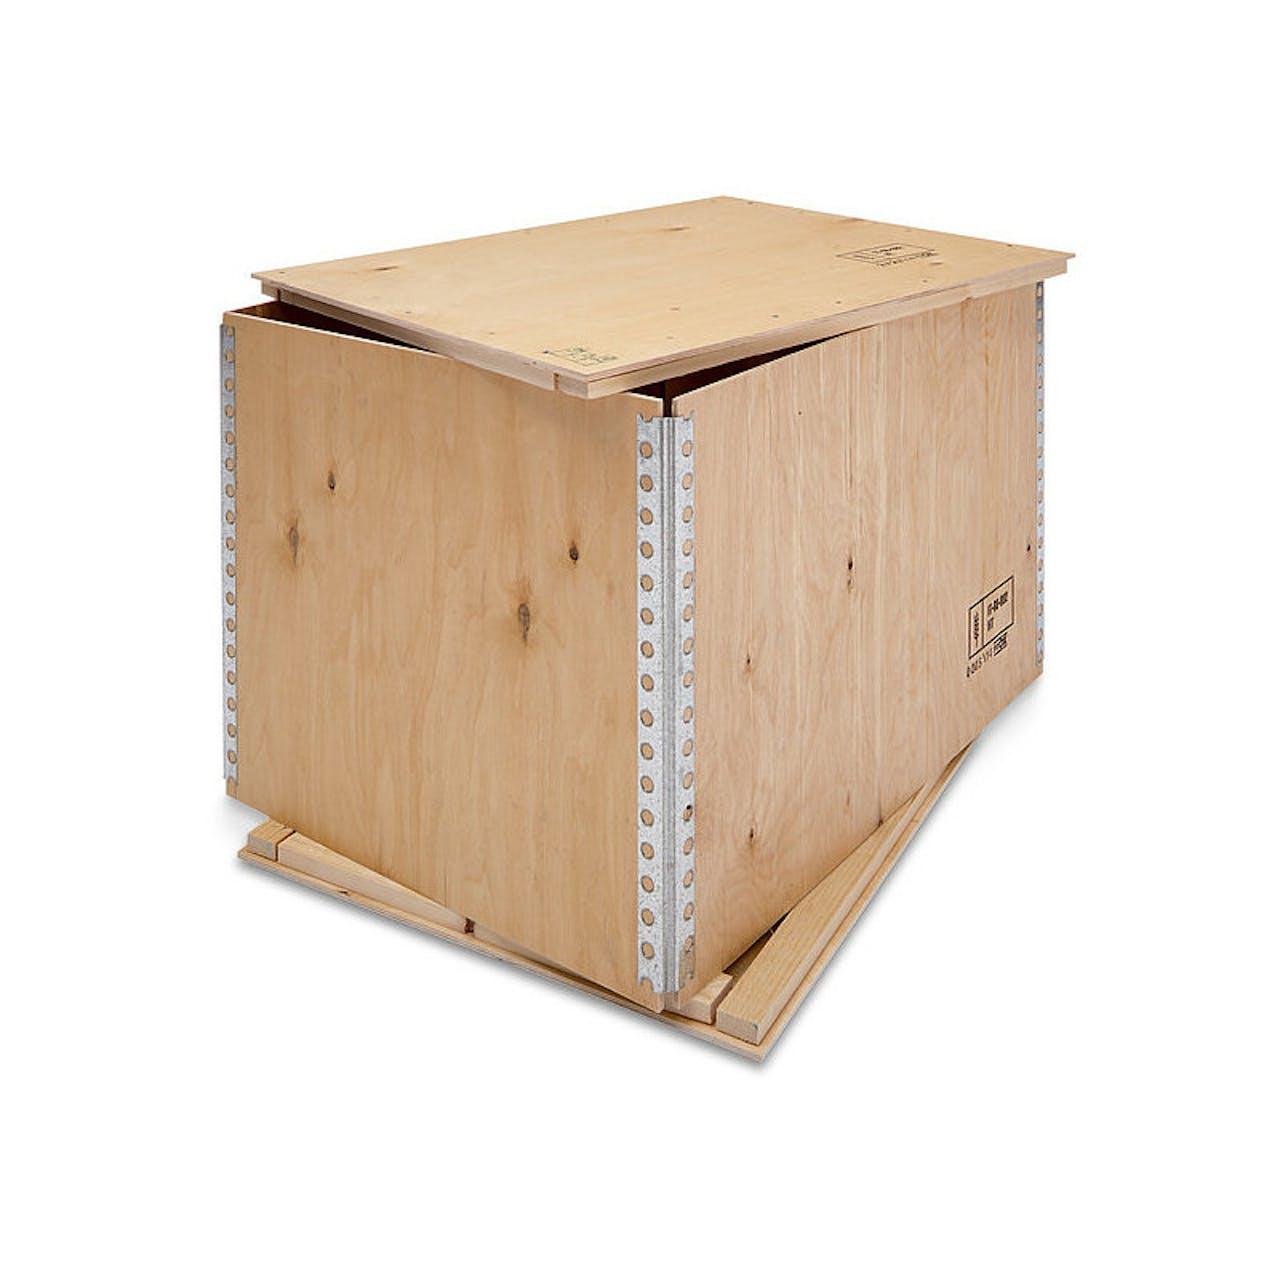 Faltkiste aus Sperrholz, 1180 x 740 x 380 mm, Europalette, 14 kg Eigengewicht